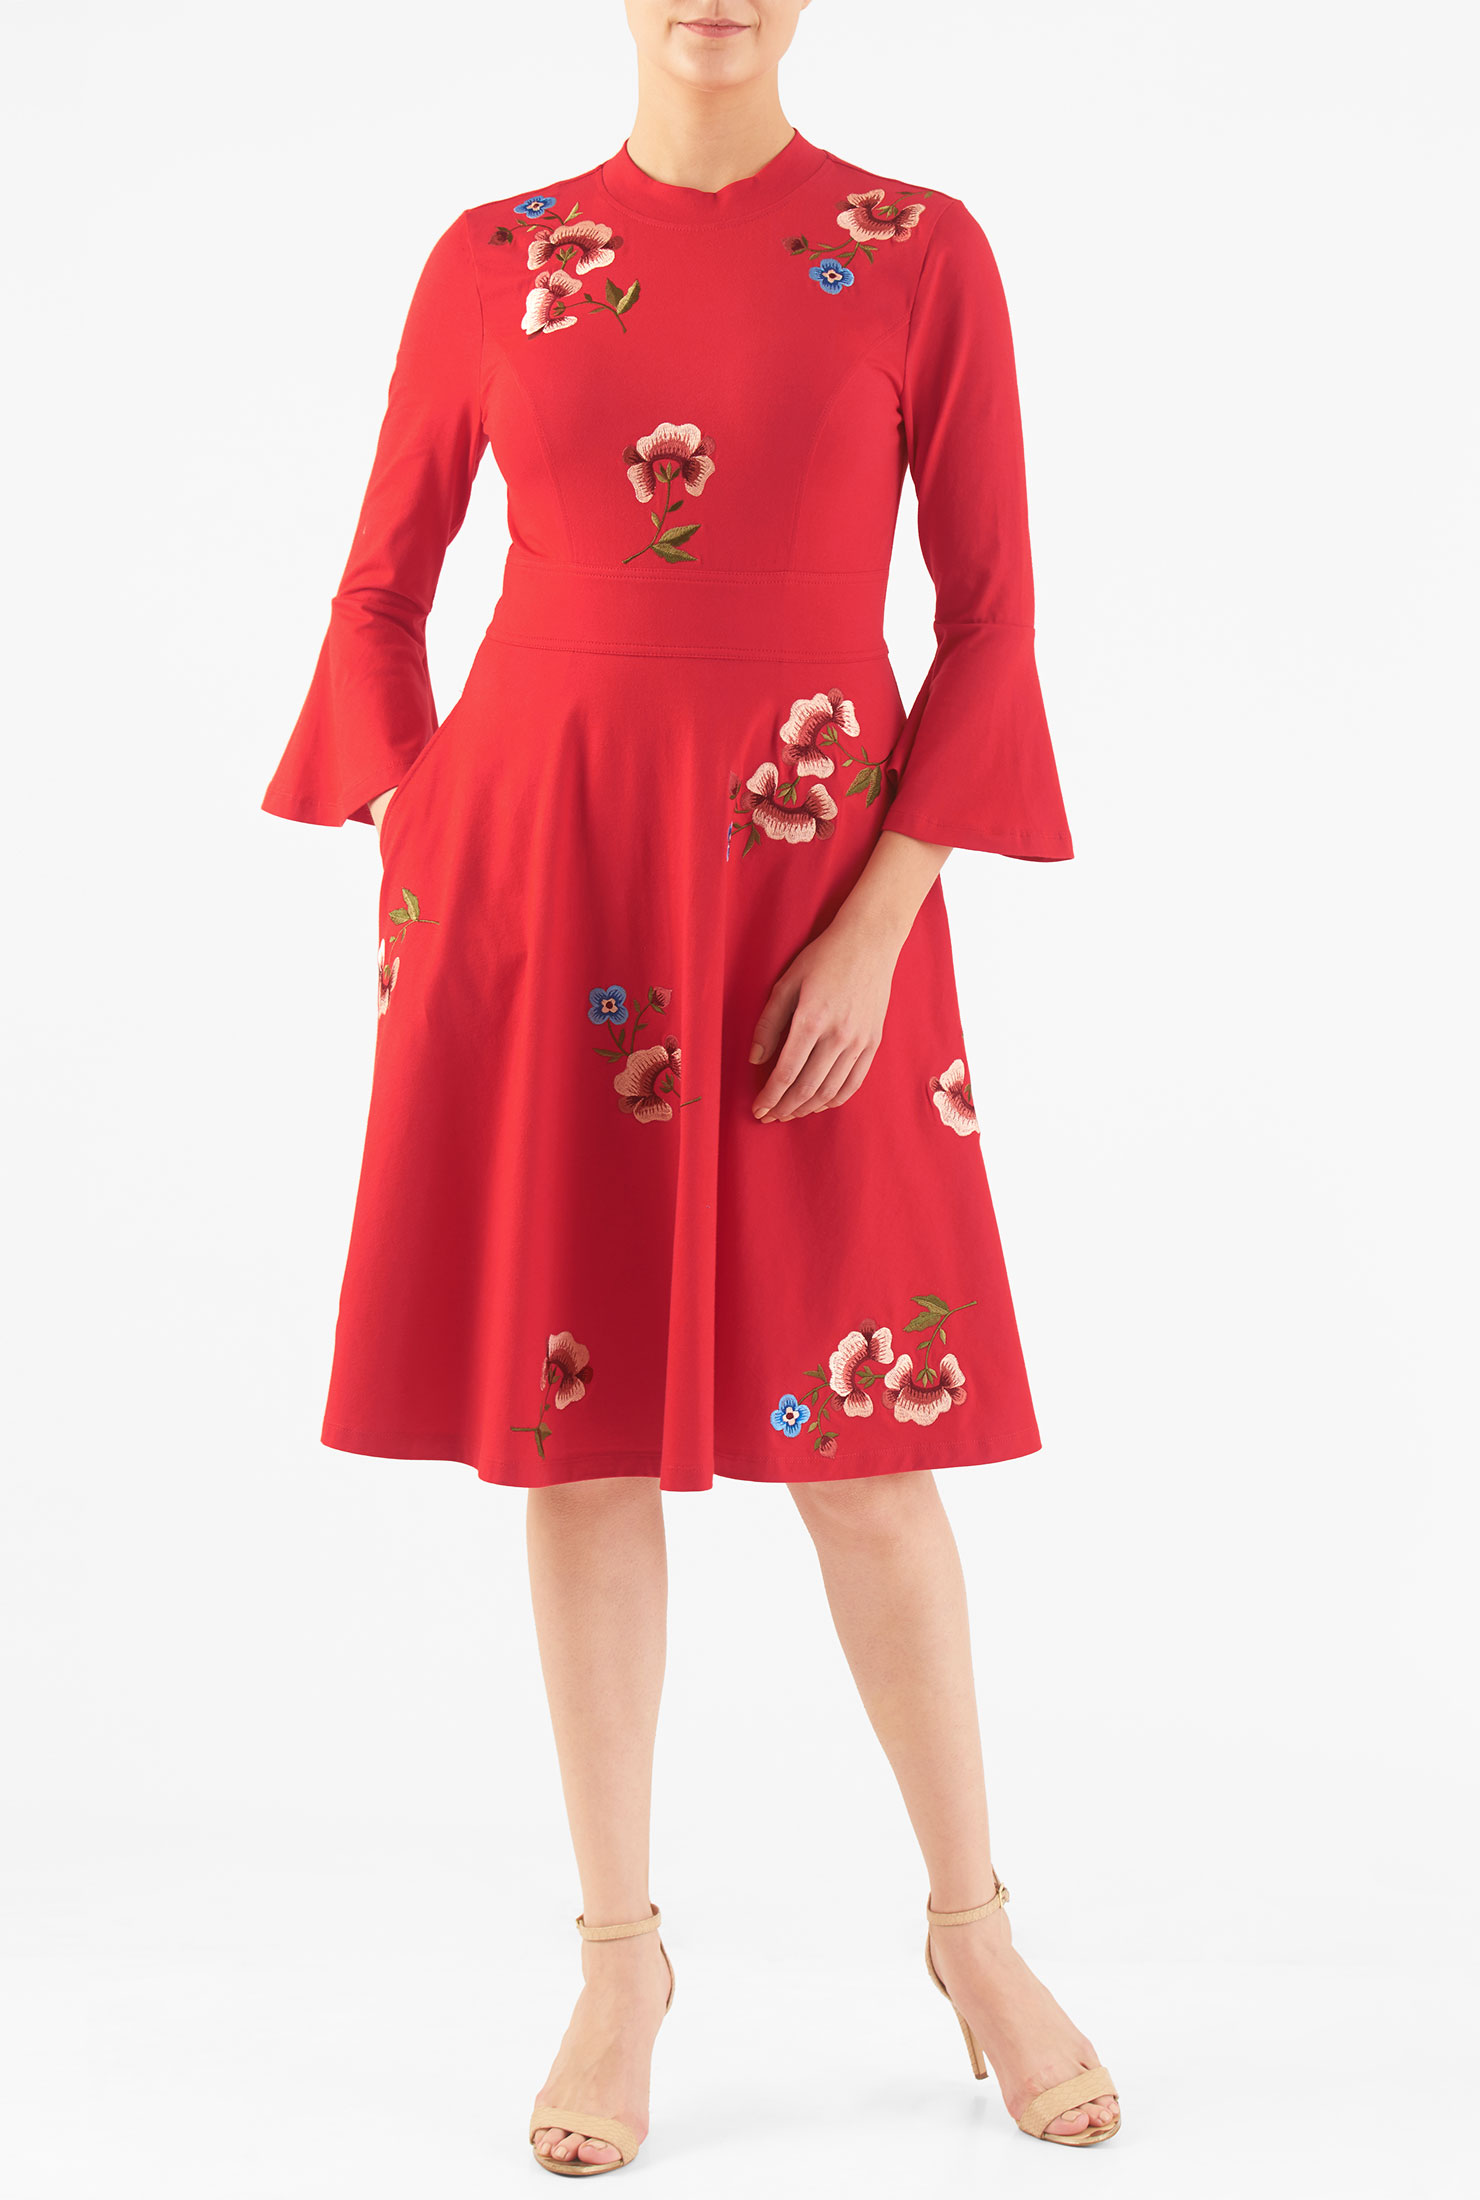 Eshakti Womens Ponte Knit Fit And Flare Dress